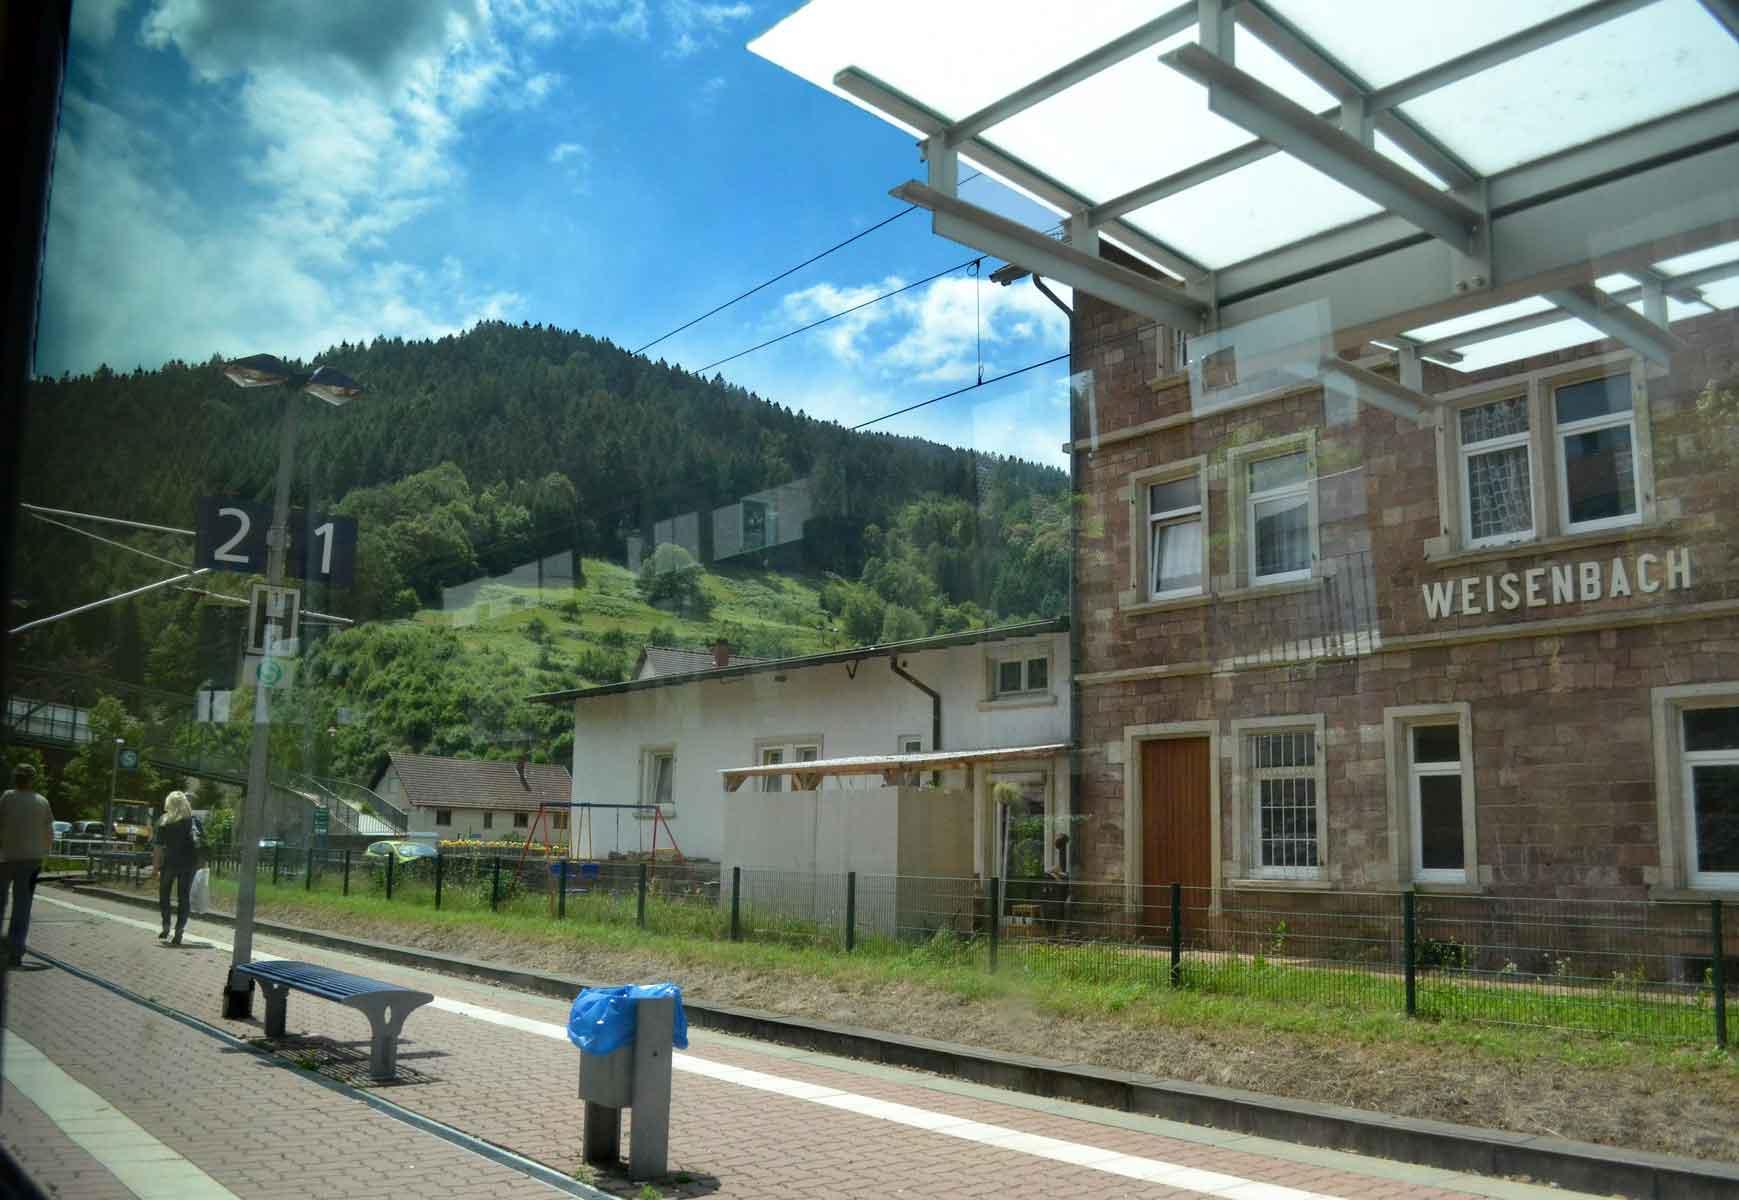 Weisenbach train station in Black Forest. Germany by train. Image©gunjanvirk